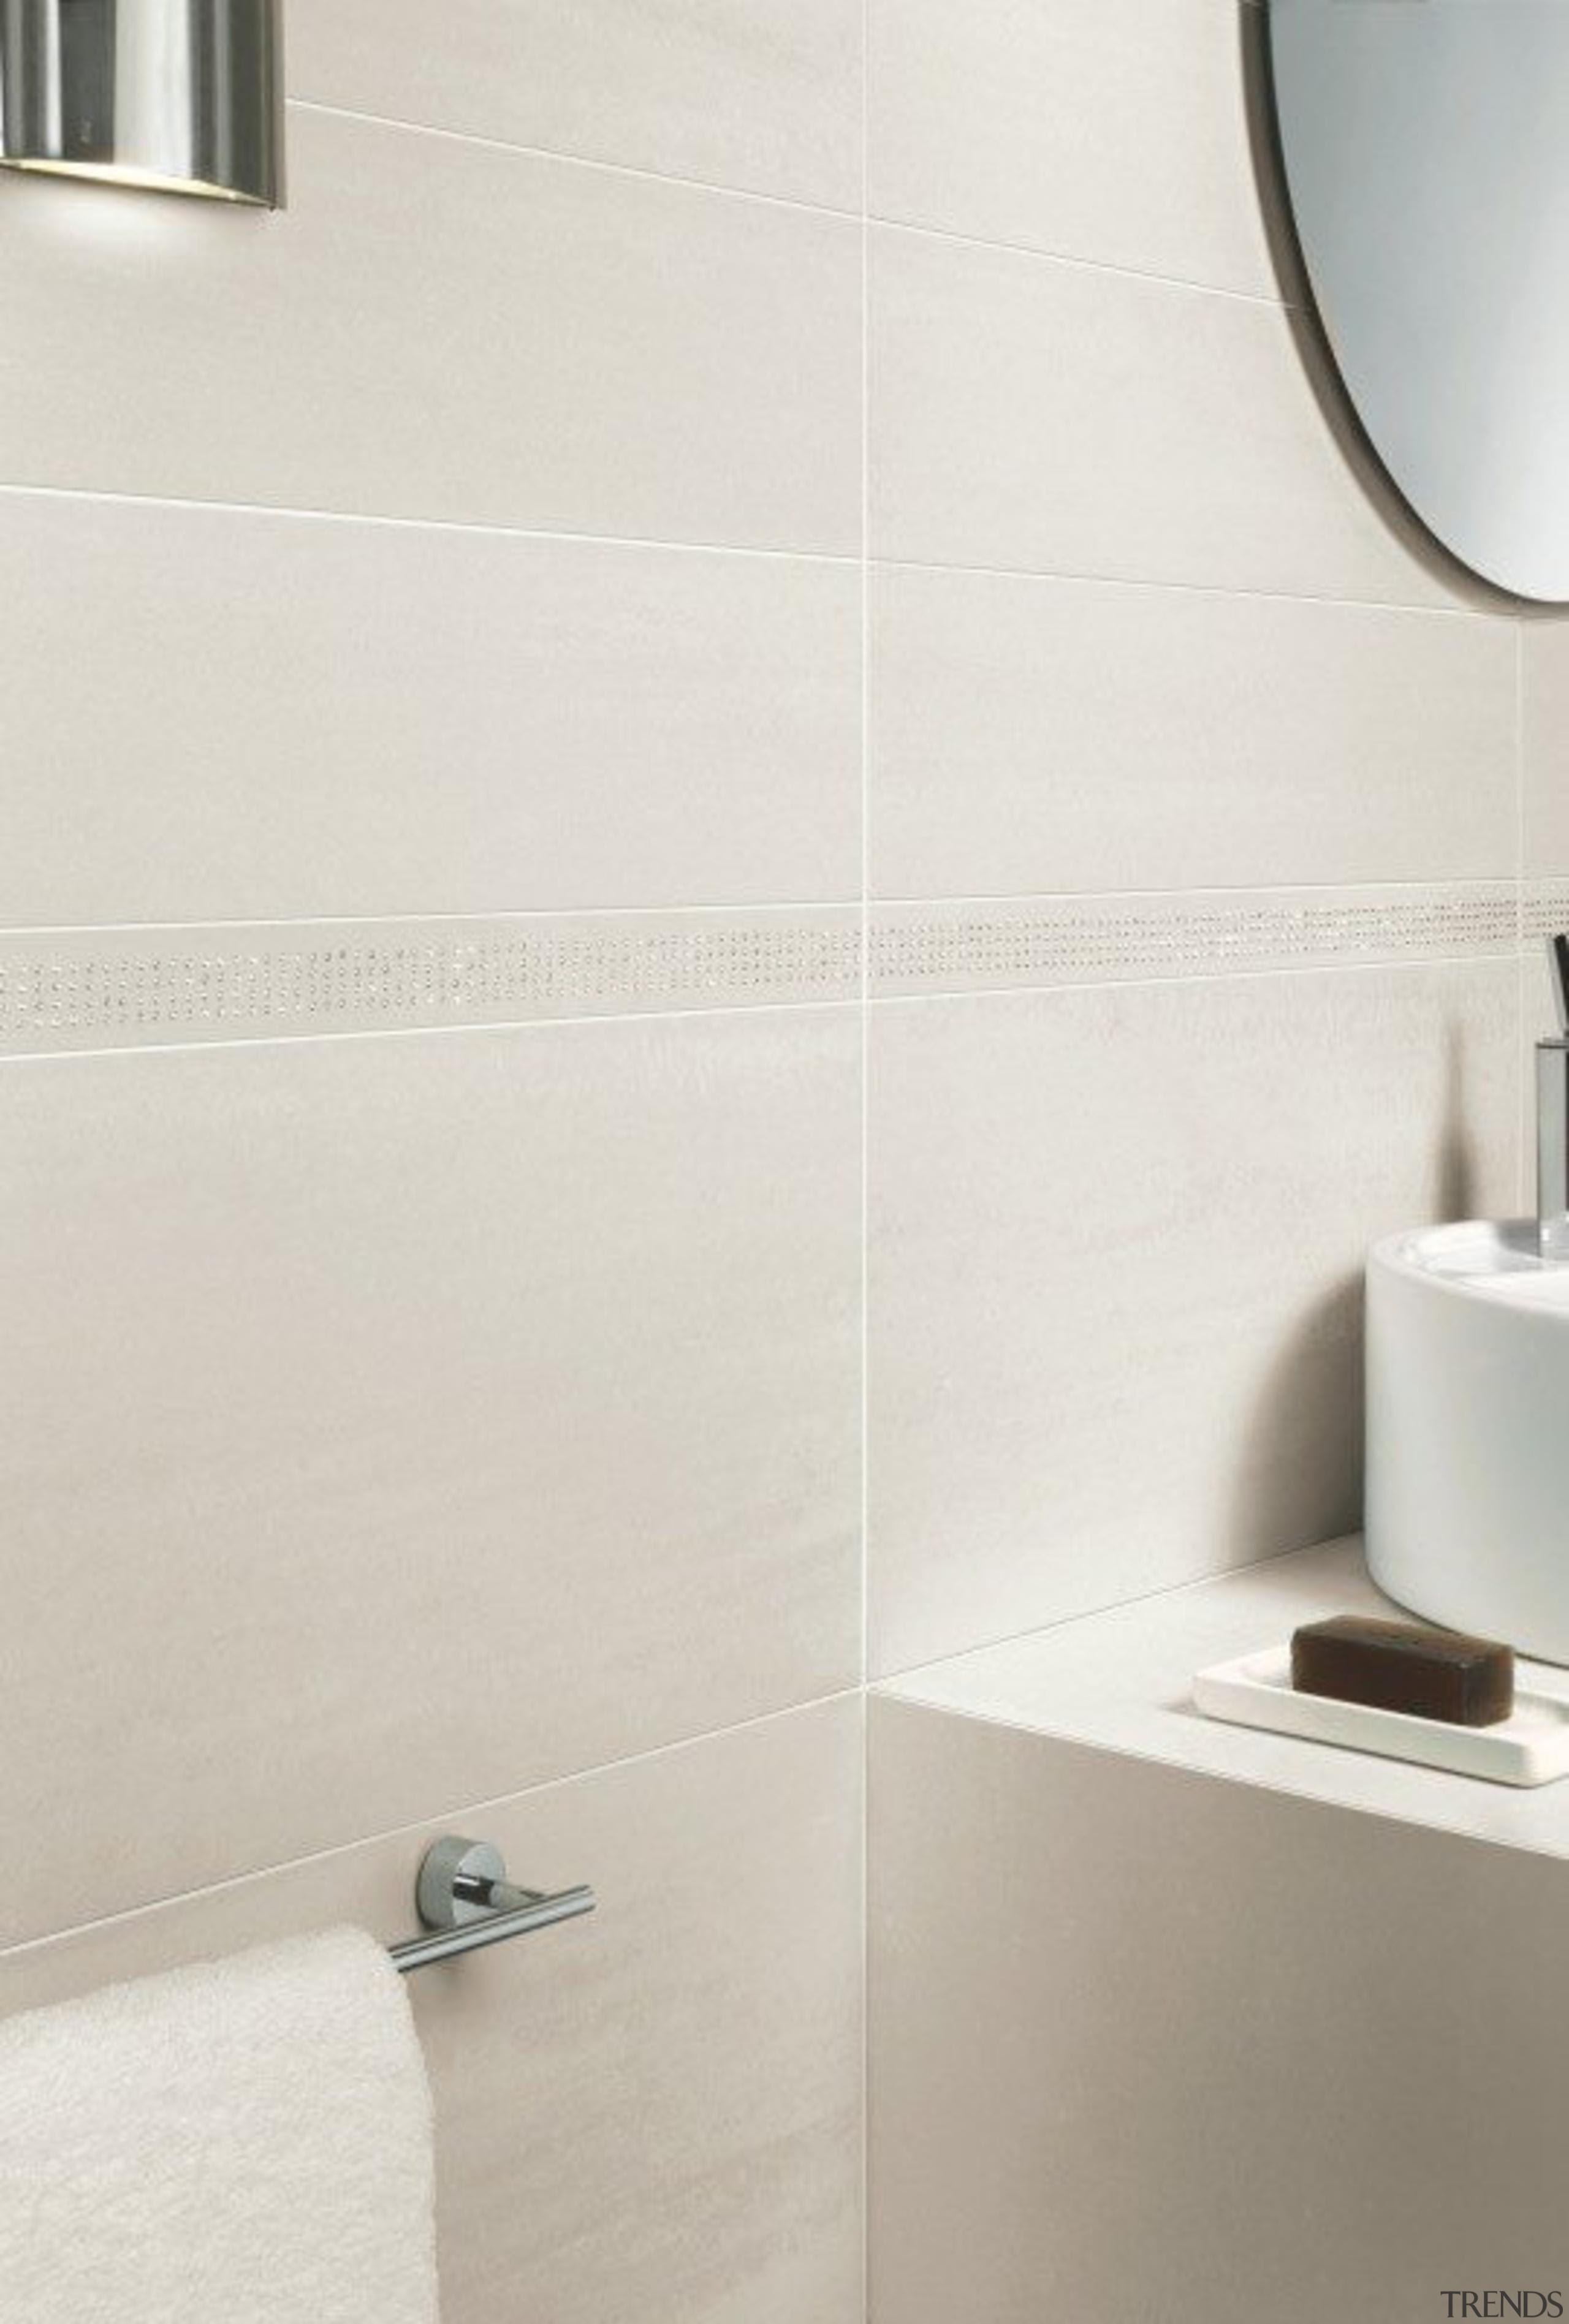 Marte Tasso - Marte Tasso - angle | angle, bathroom, bathroom accessory, bathroom sink, ceramic, floor, flooring, interior design, plumbing fixture, product, product design, tap, tile, toilet seat, wall, white